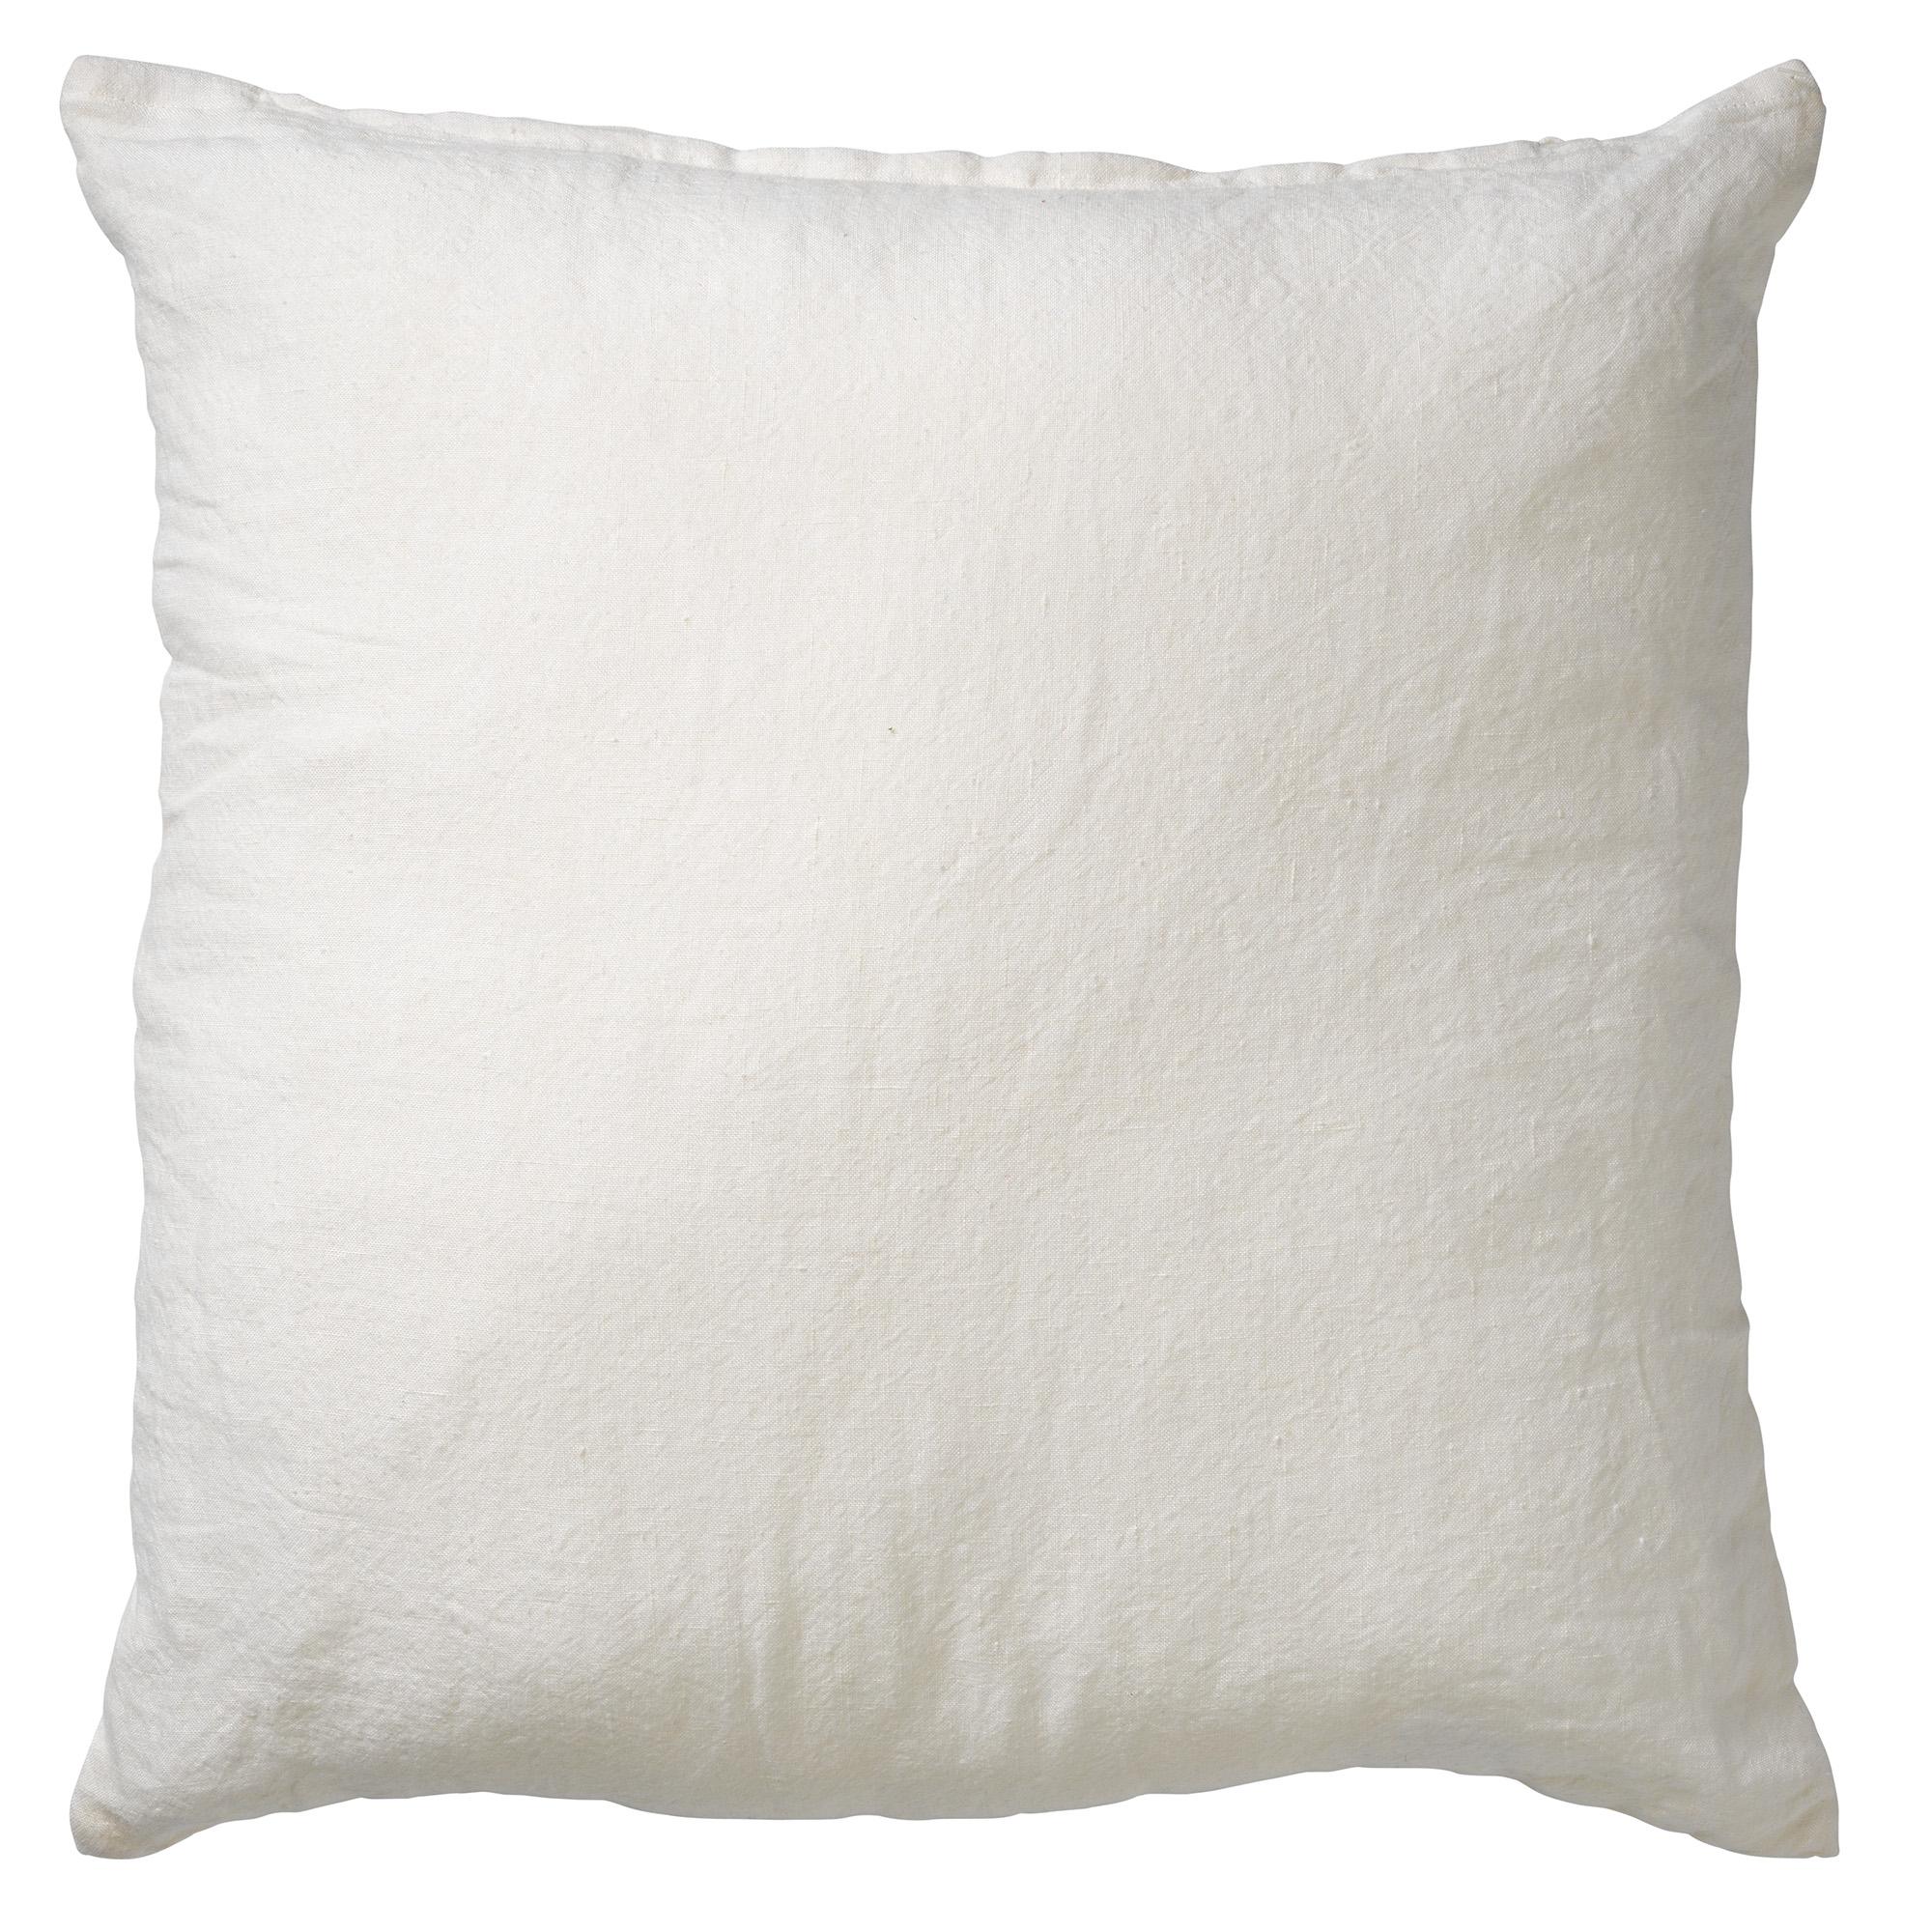 LINN - Sierkussen linnen Snow White 45x45 cm